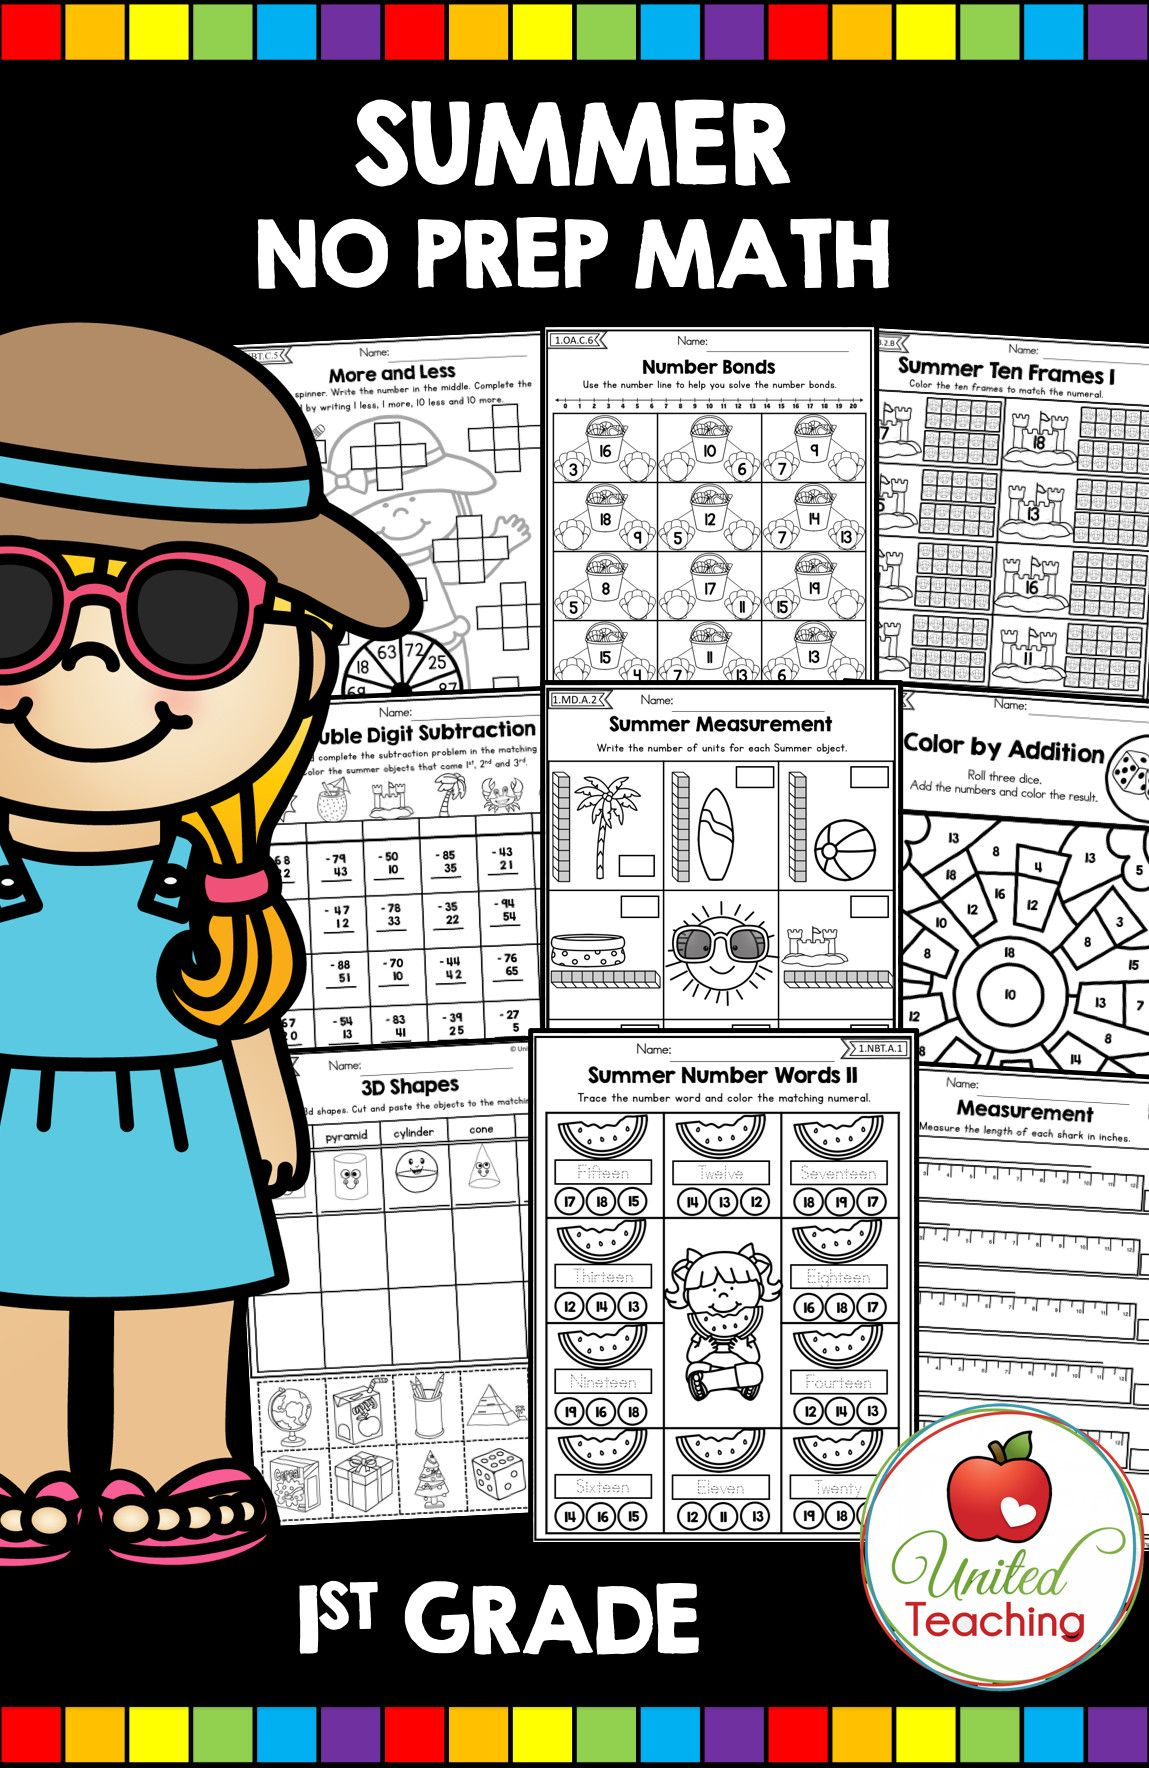 6 Summer Math Worksheet In